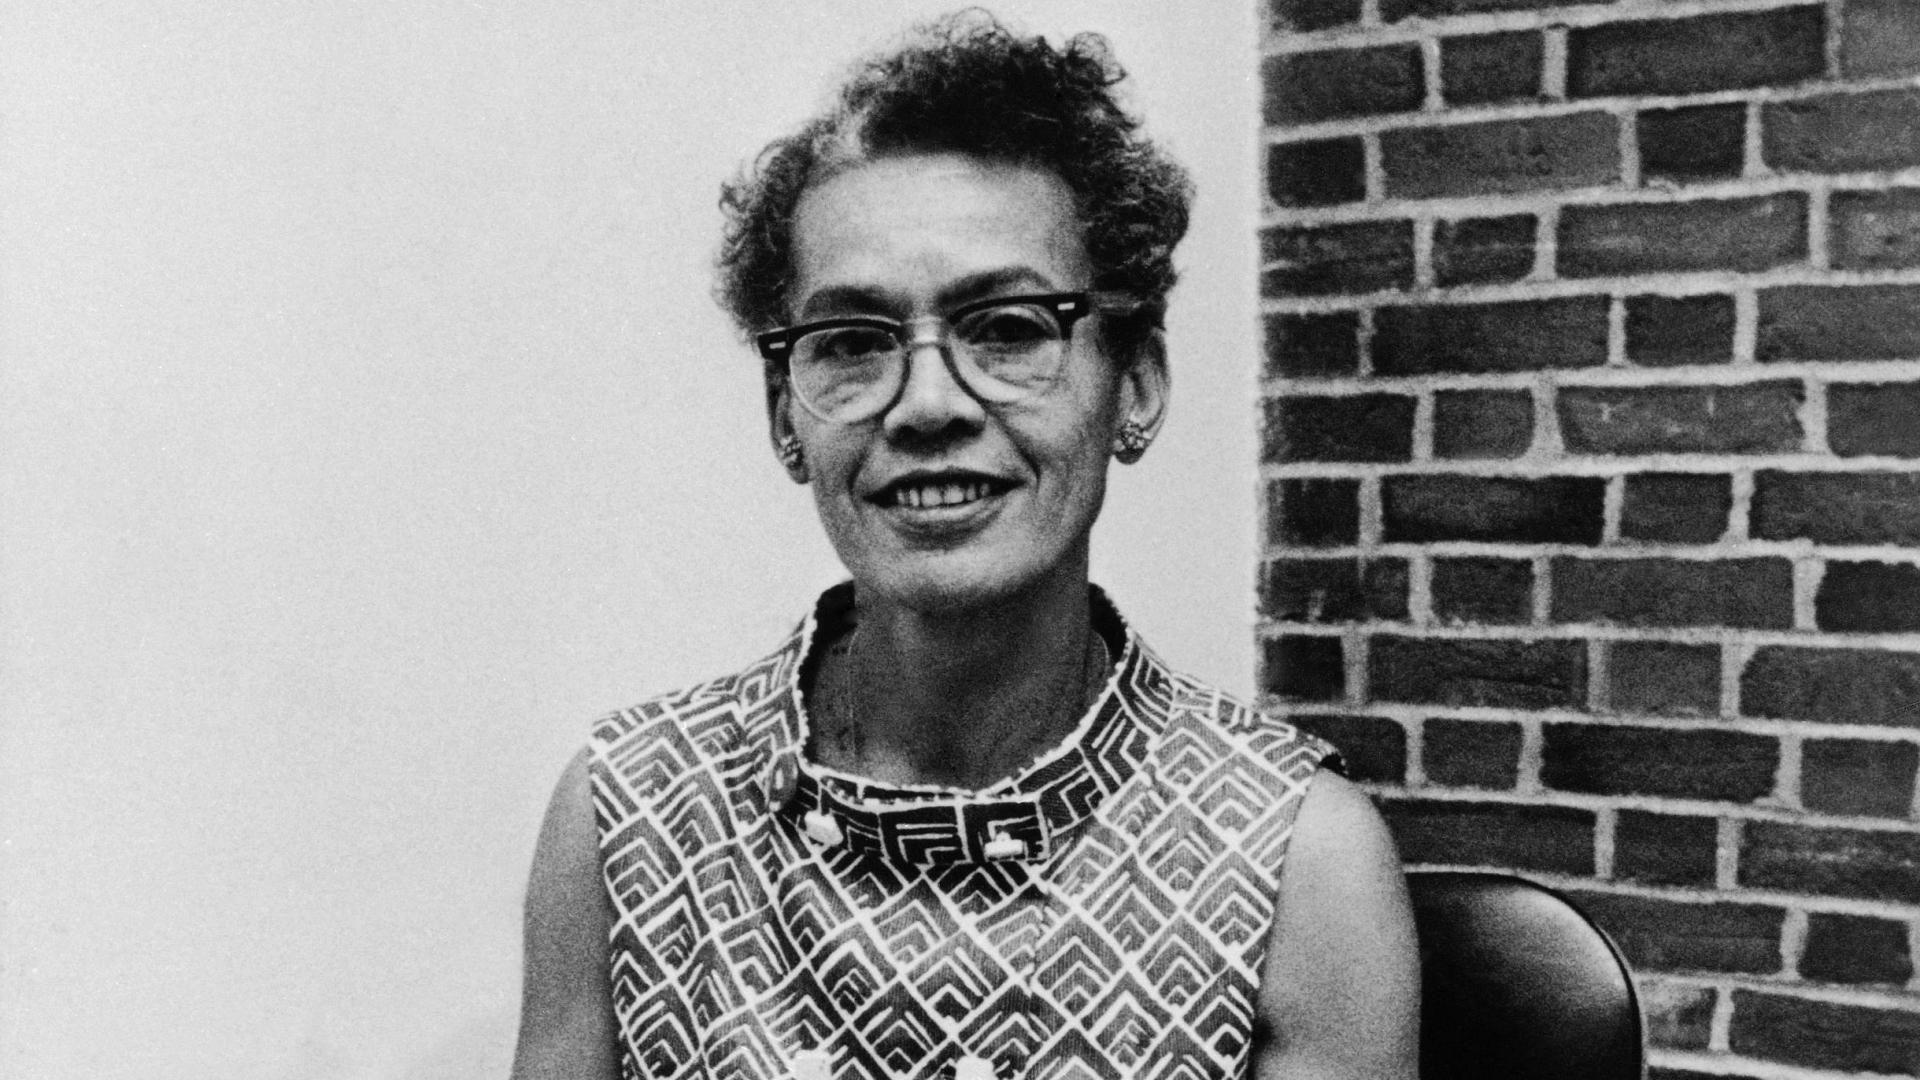 Brandeis University professor Dr. Pauli Murray, 1970. (Credit: AP Photo)